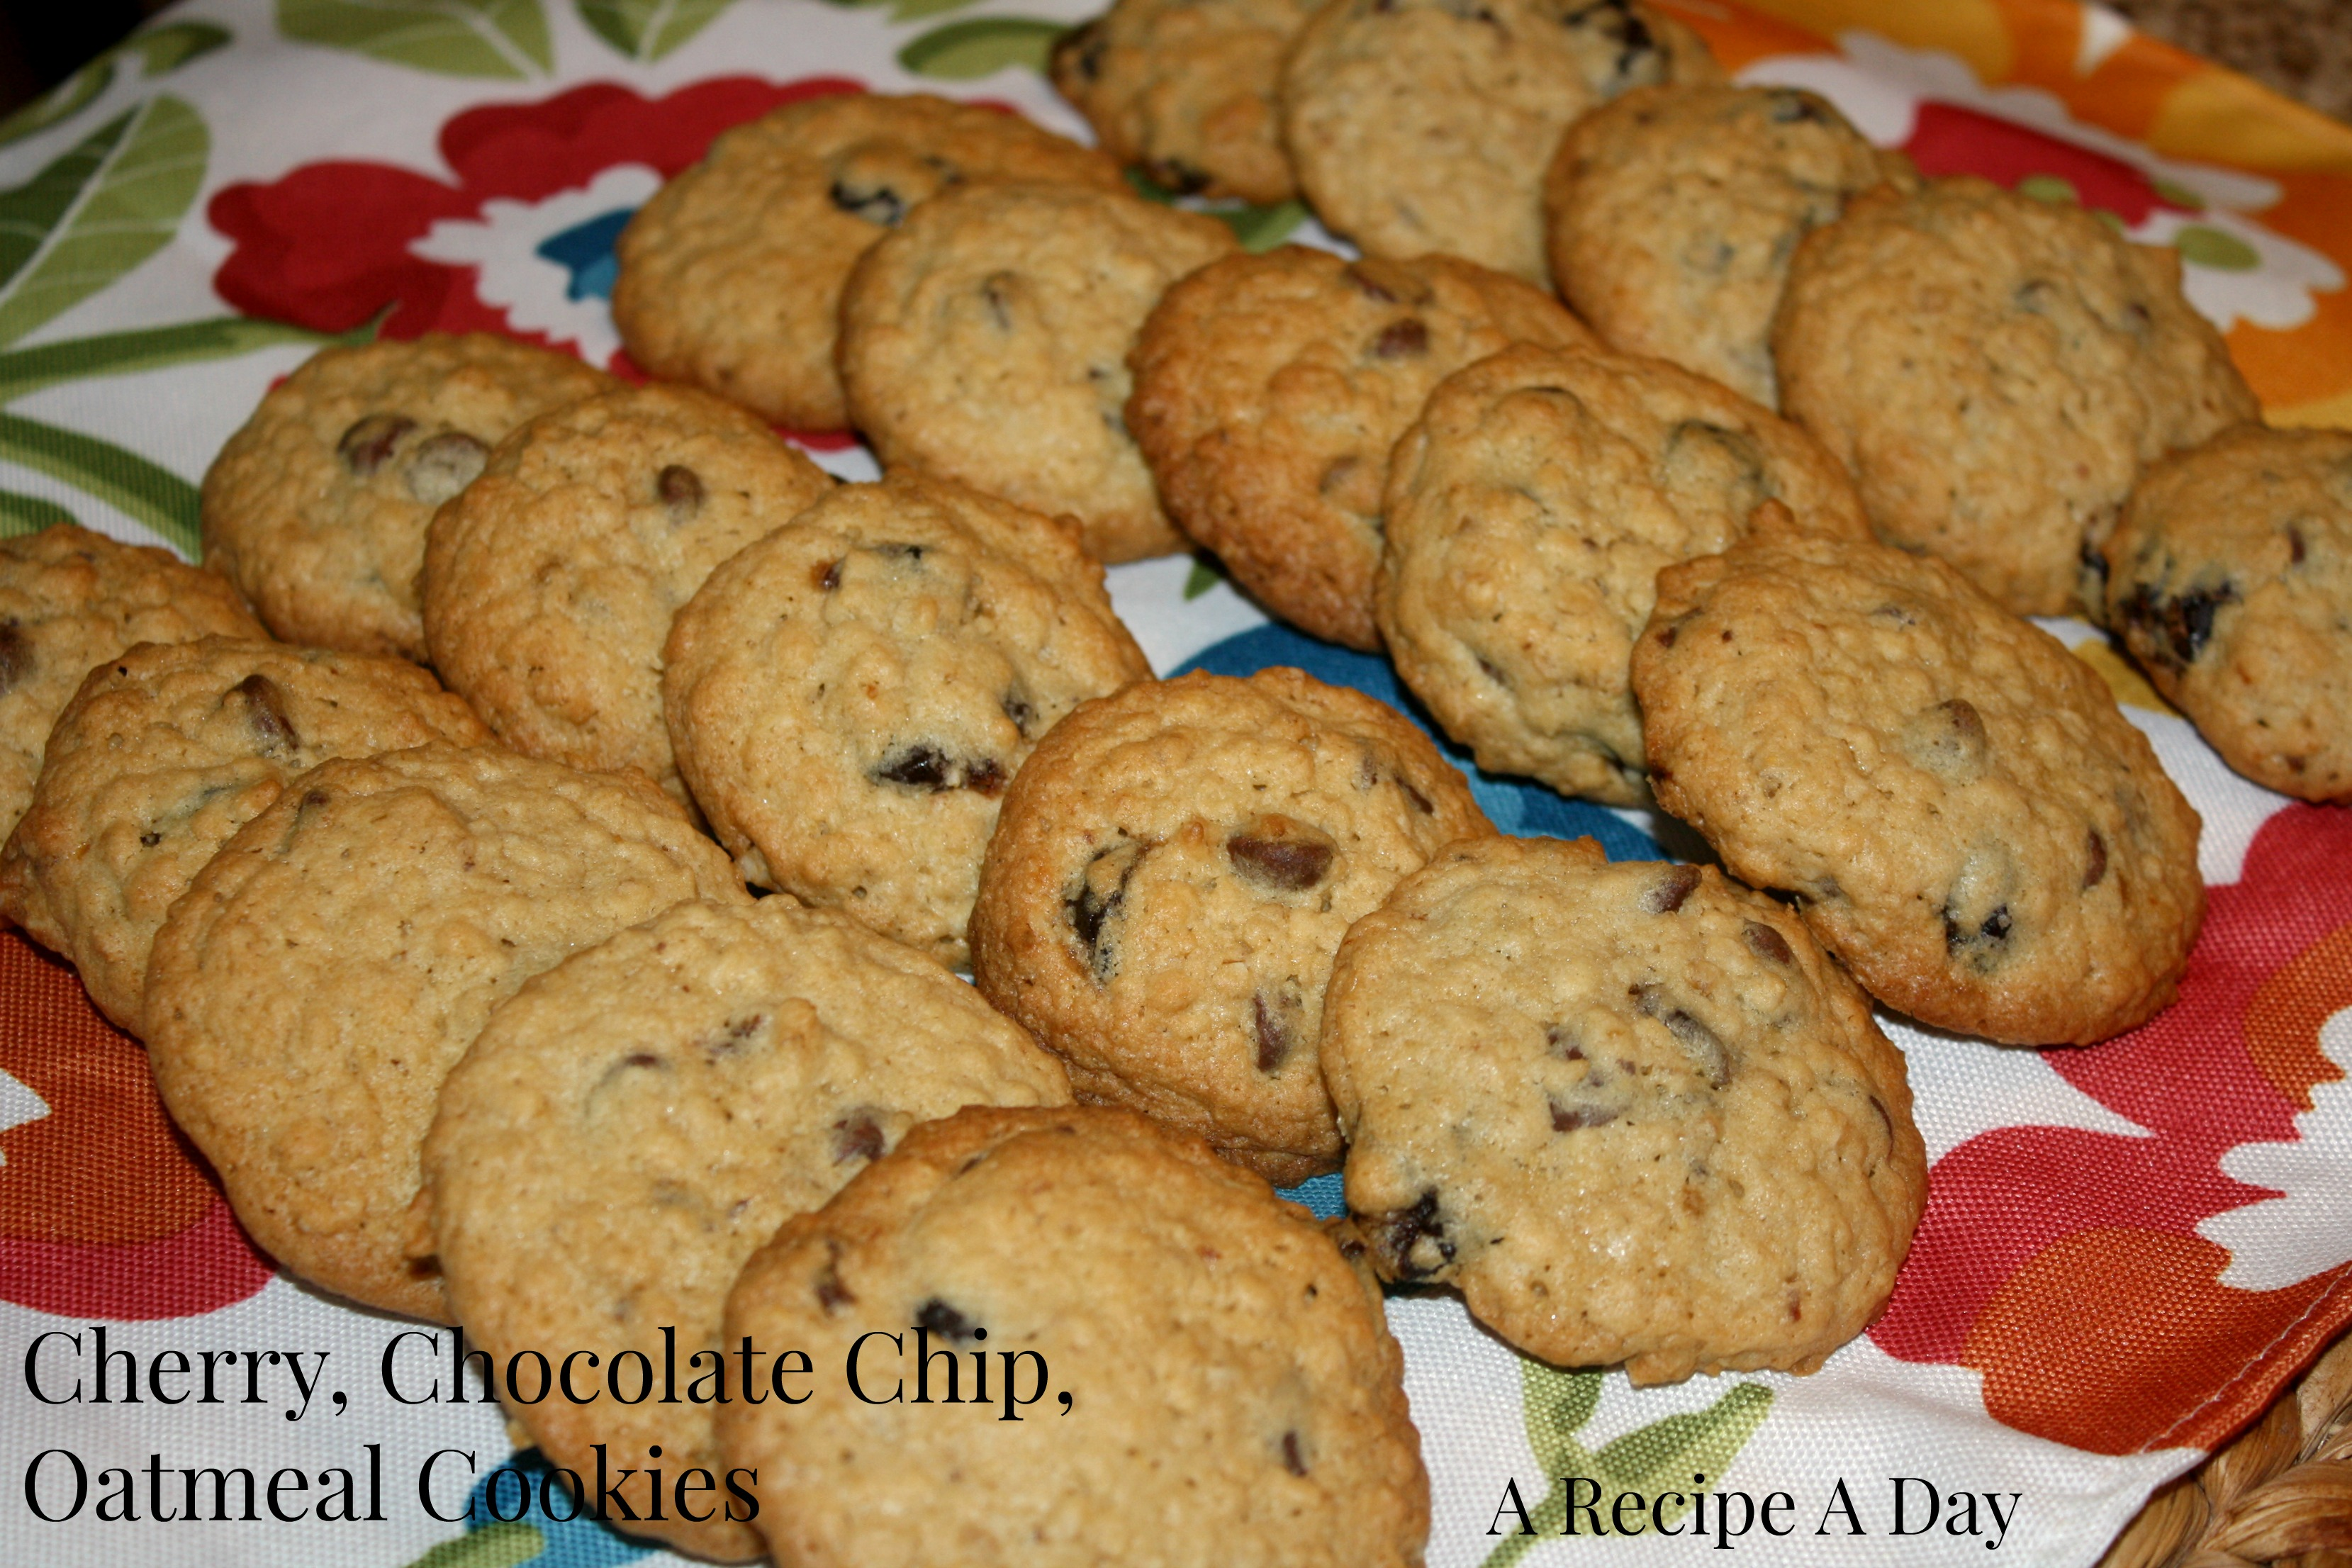 Cherry, Chocolate Chip, Oatmeal Cookies